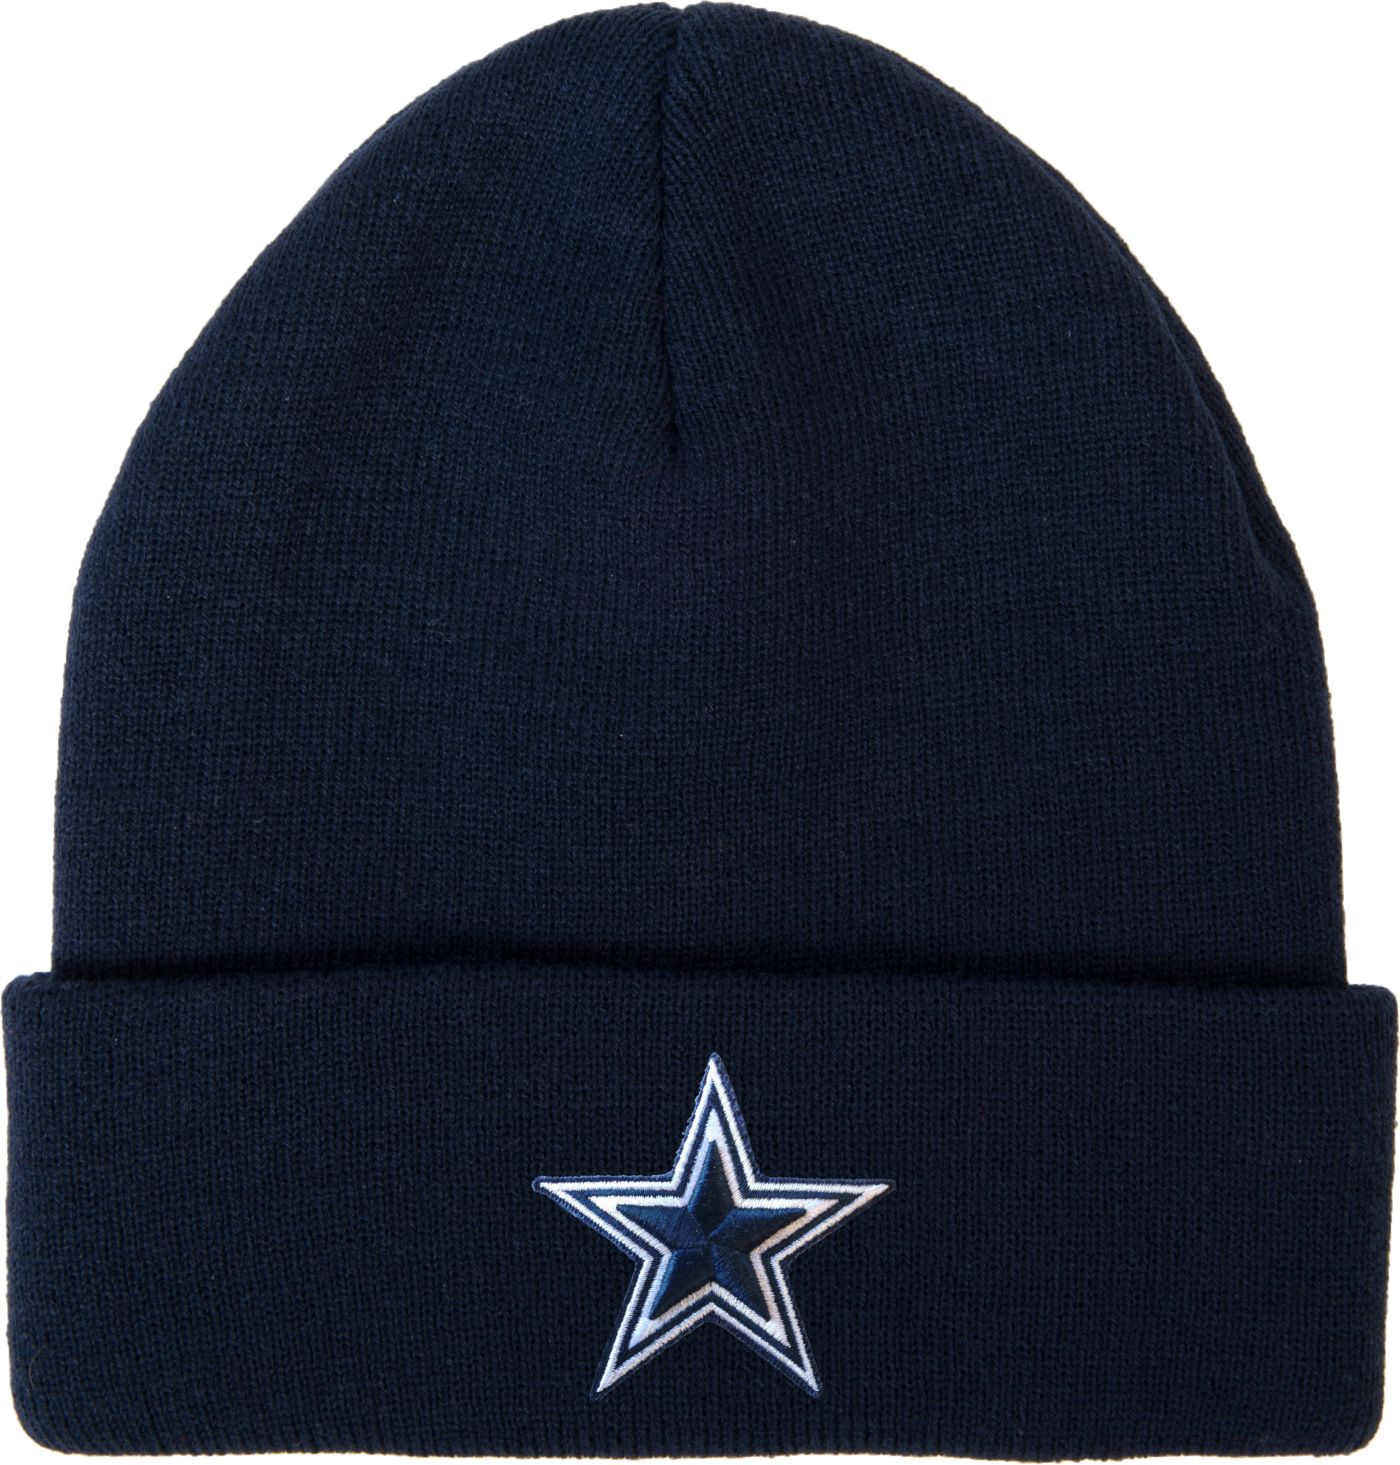 Dallas Cowboys Merchandising Men's Basic Cuff Navy Knit